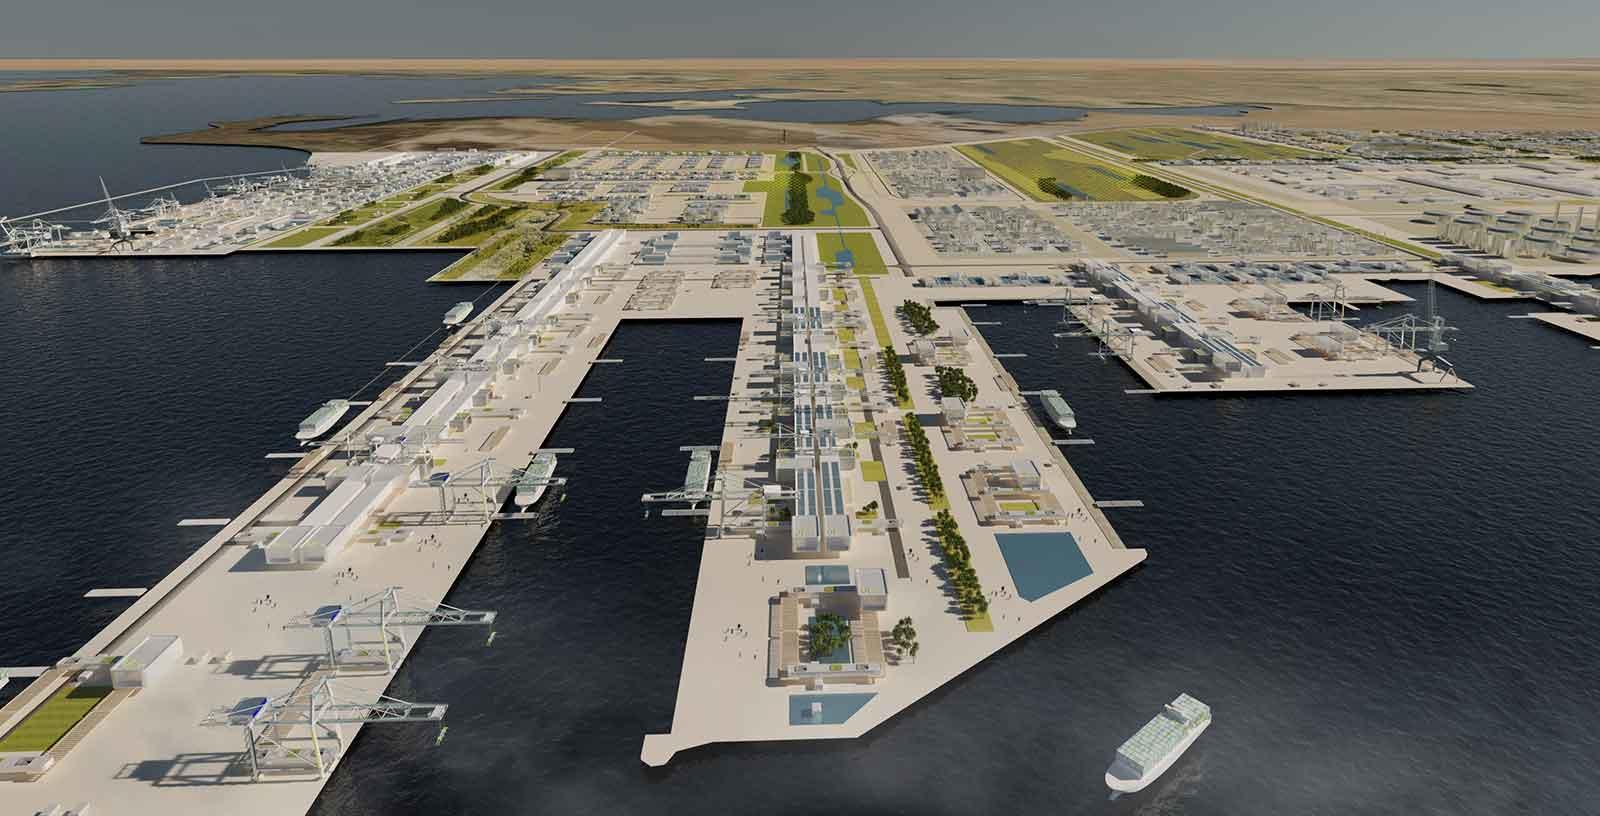 IDOM_Ras Al Khair Industrial City Marketing Study 3